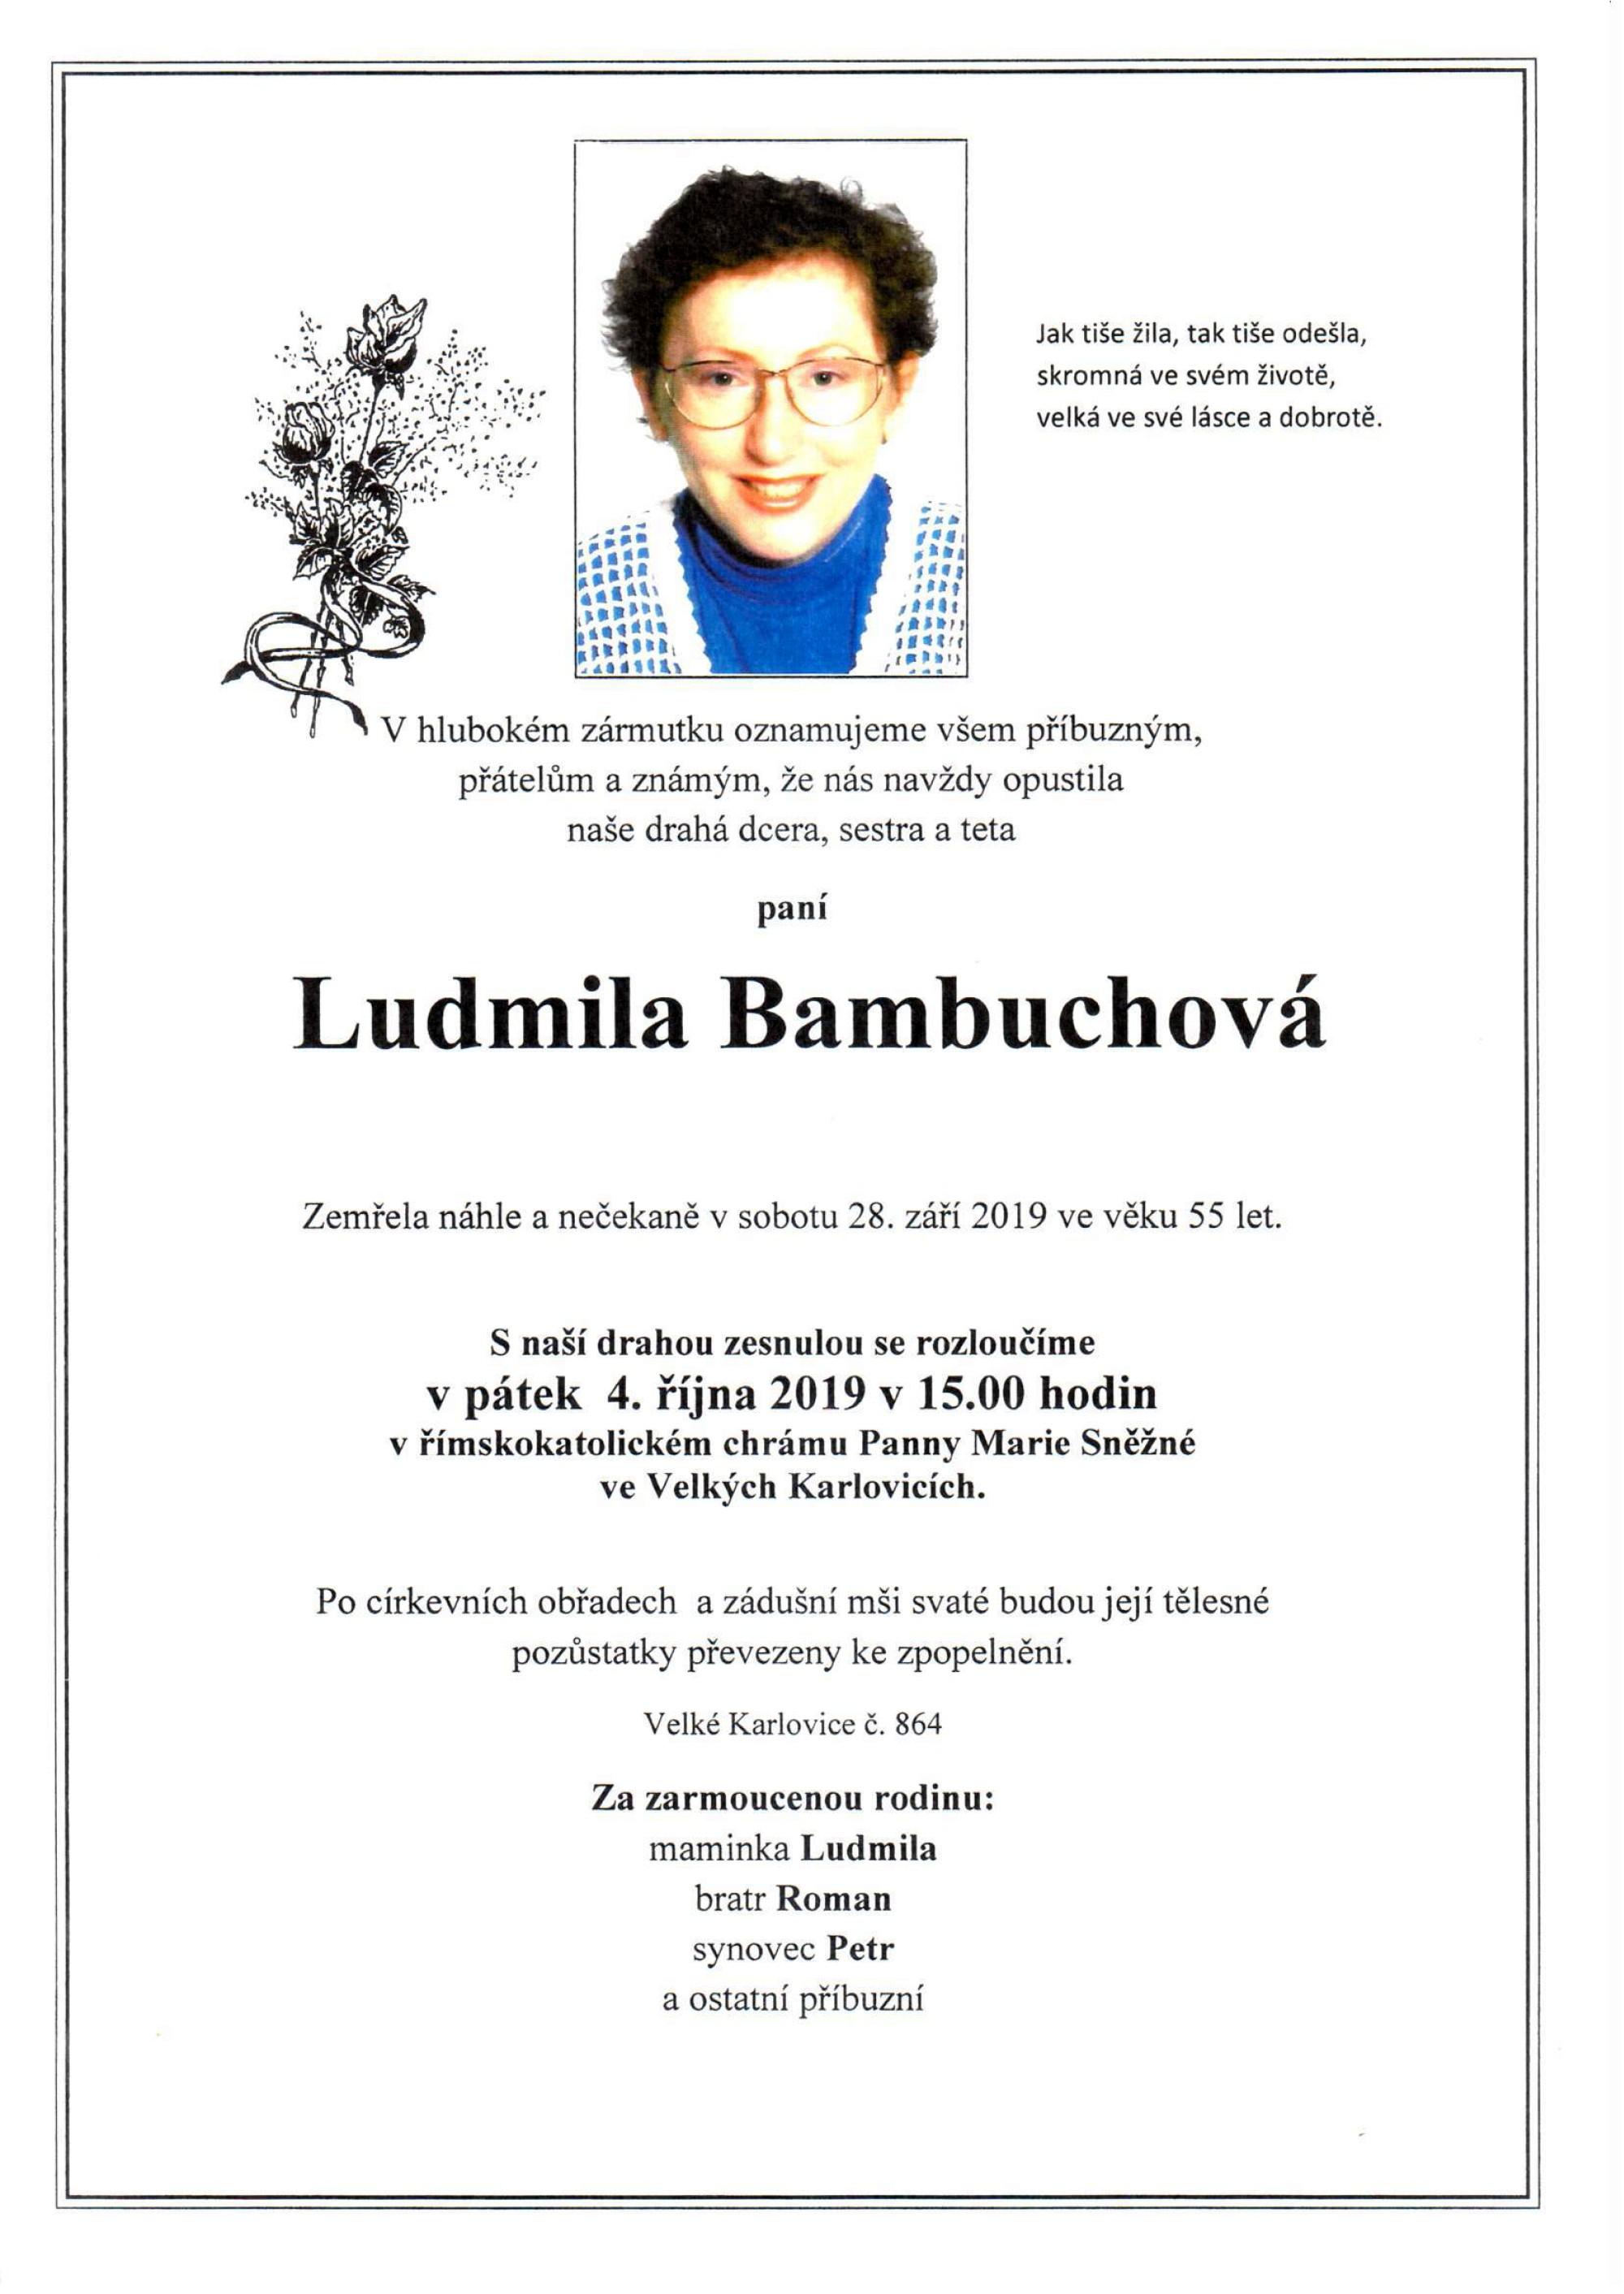 Ludmila Bambuchová